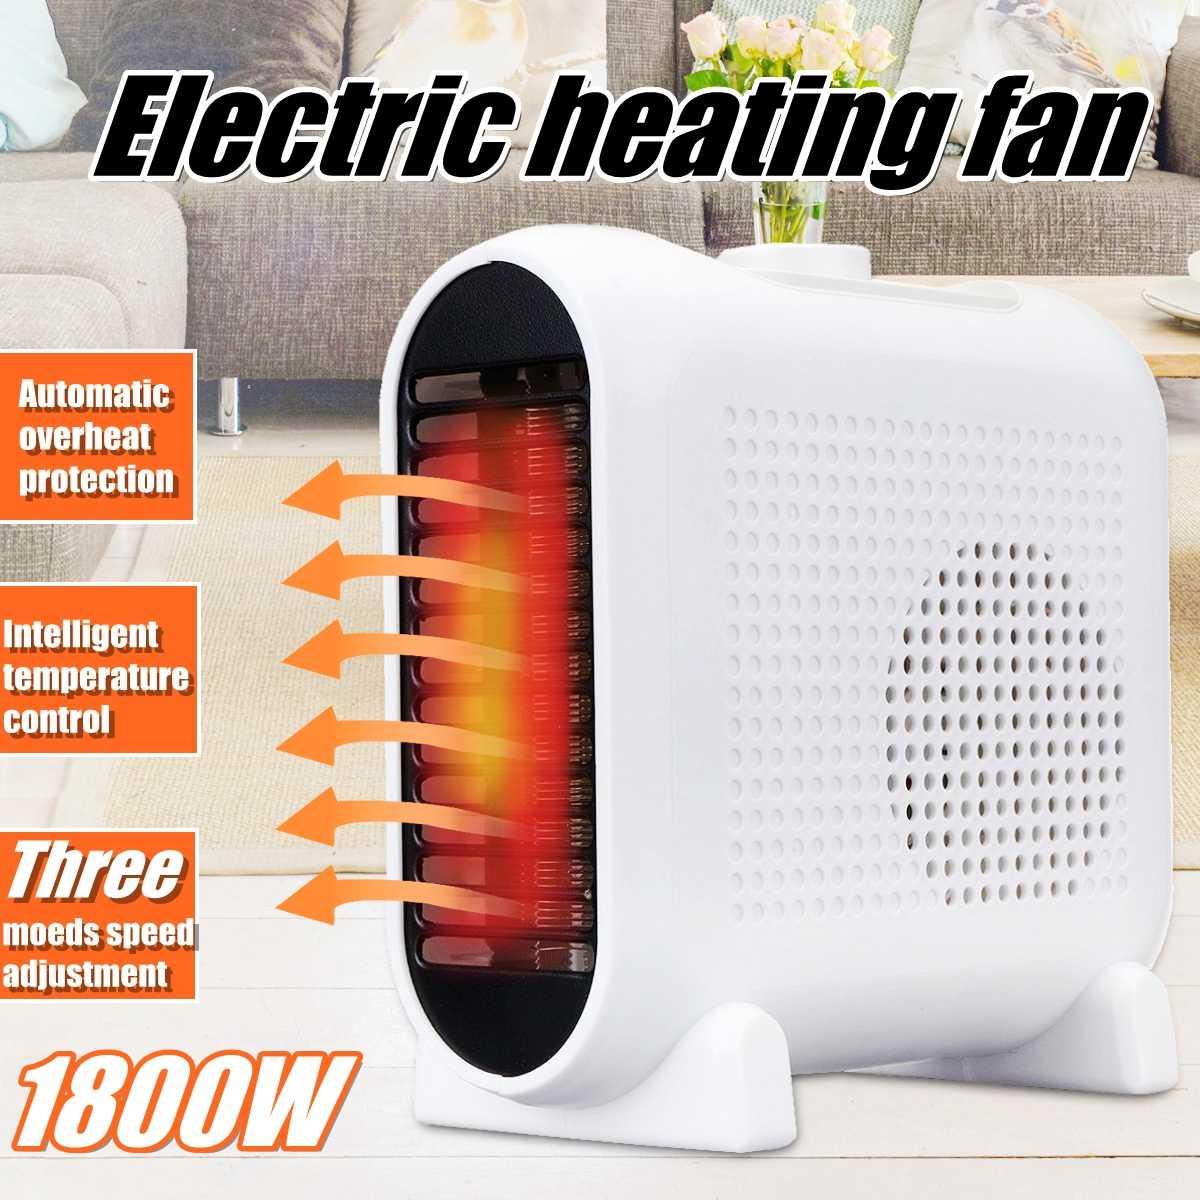 1800W 3 Speeds Electric Heater Mini Fan Heater Desktop Household Wall Handy Heating Stove Radiator Warmer Machine for Winter